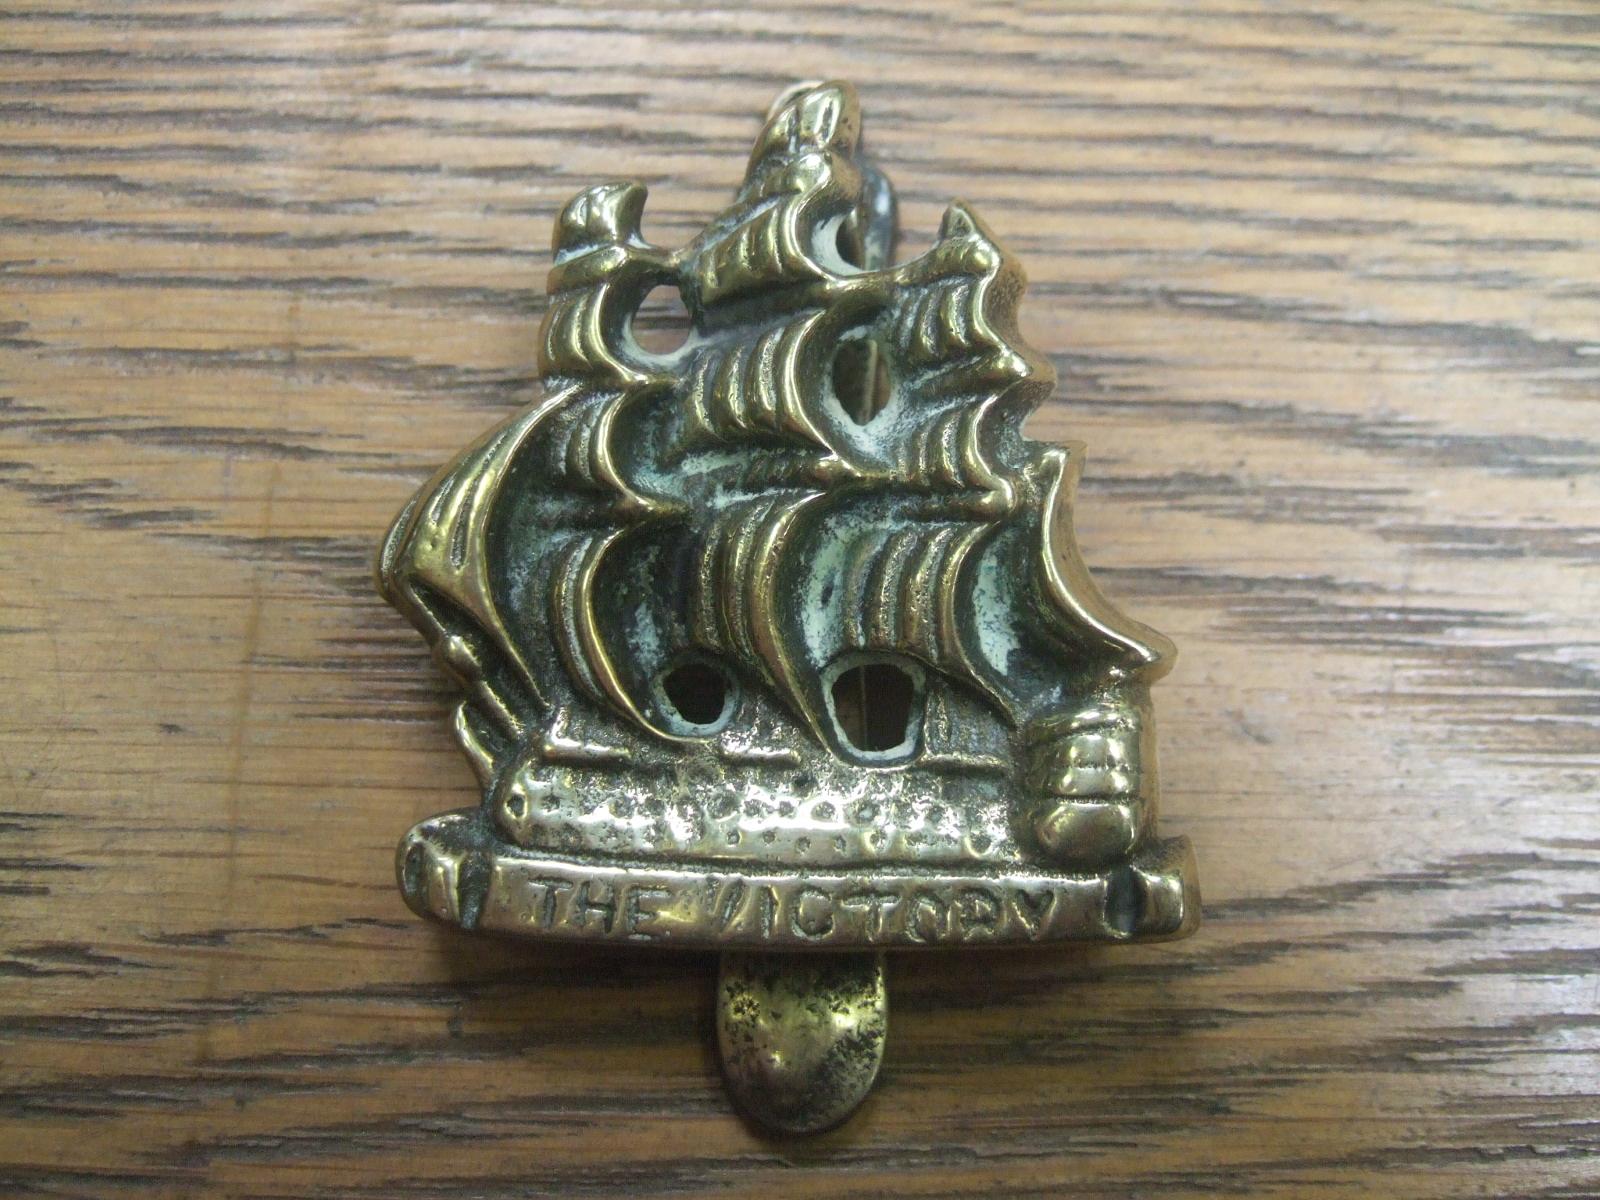 HMS Victory Ship - D062